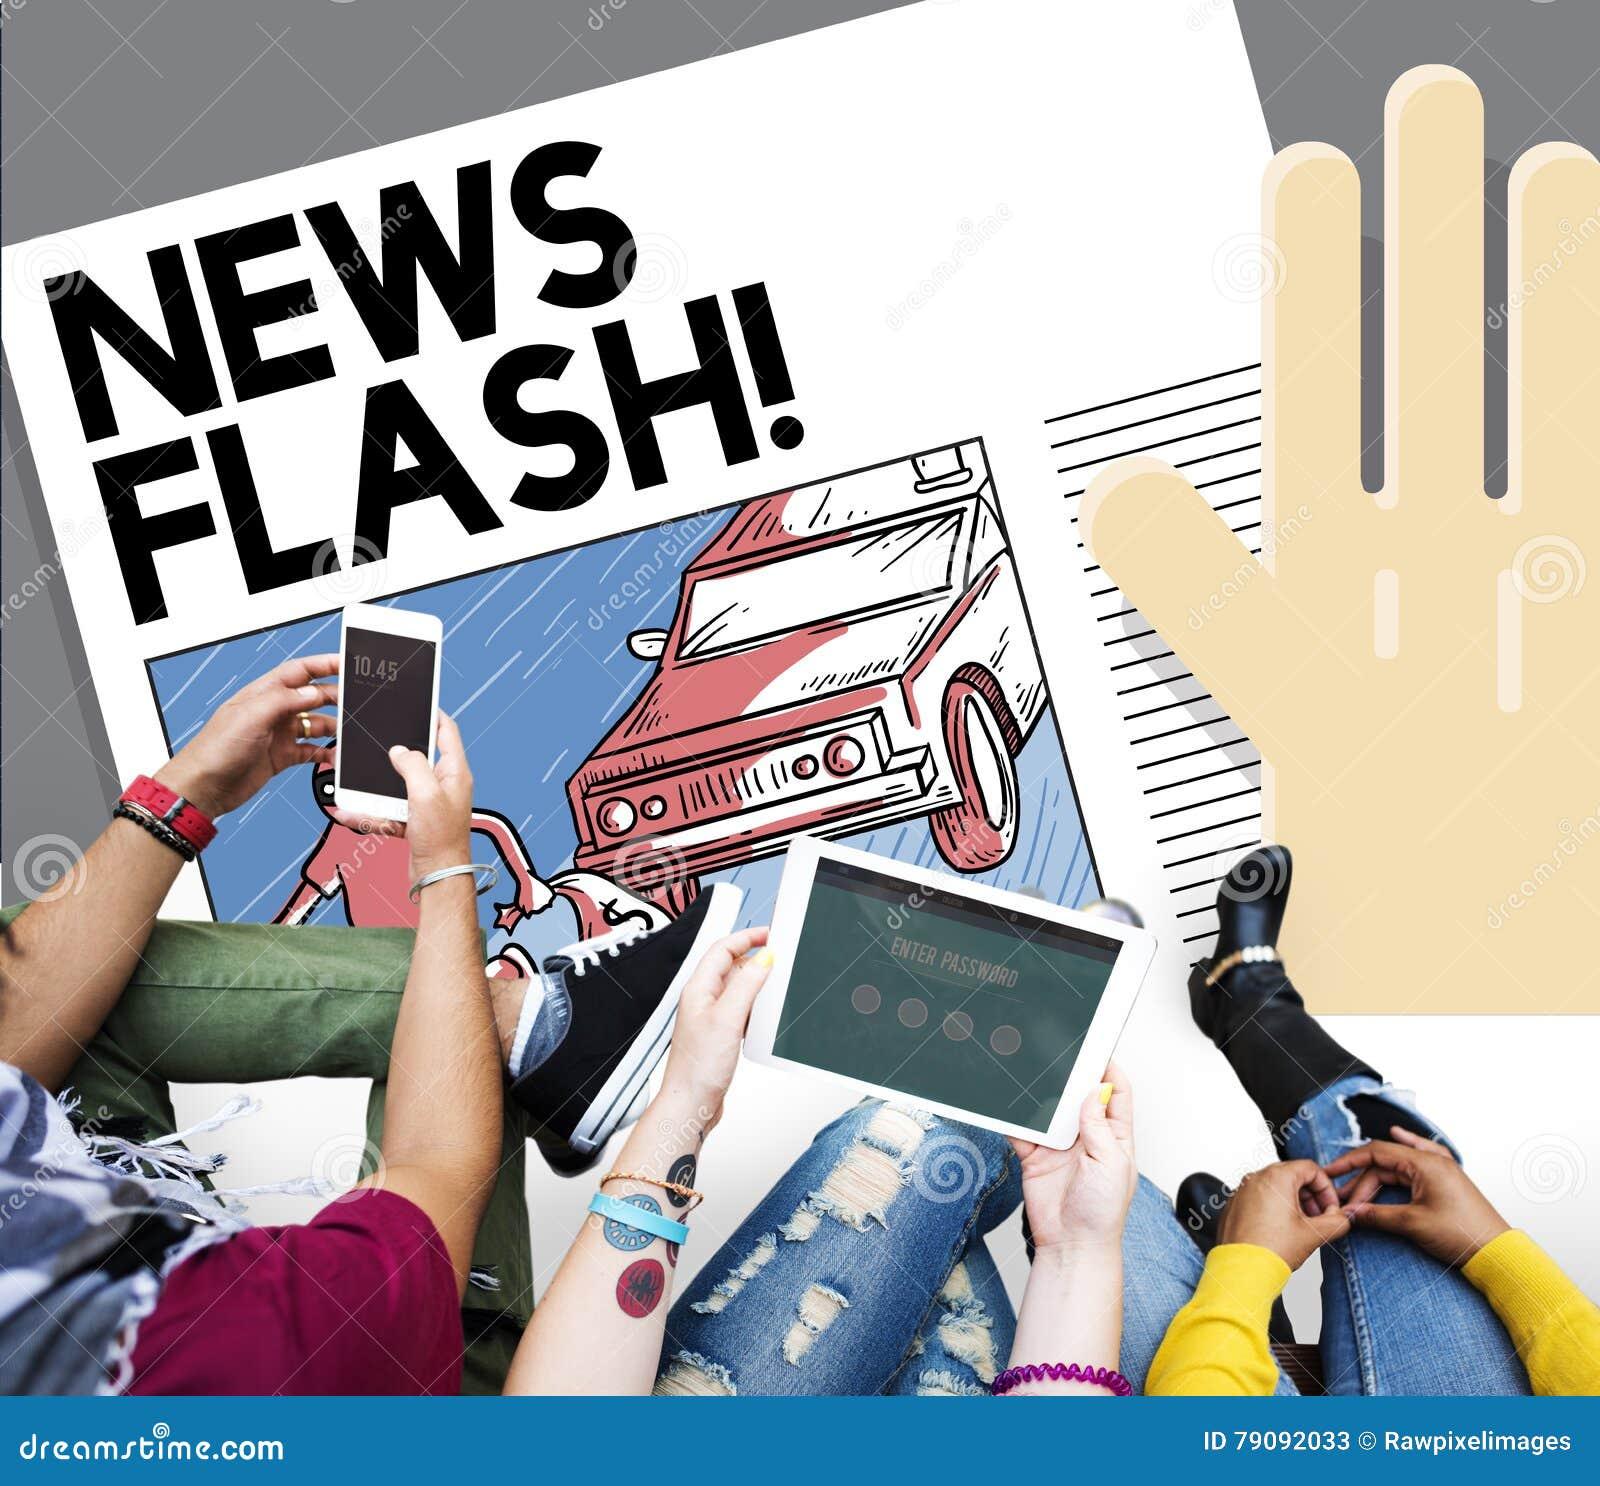 NEWS FLASH Royalty-Free Stock Image | CartoonDealer.com ...